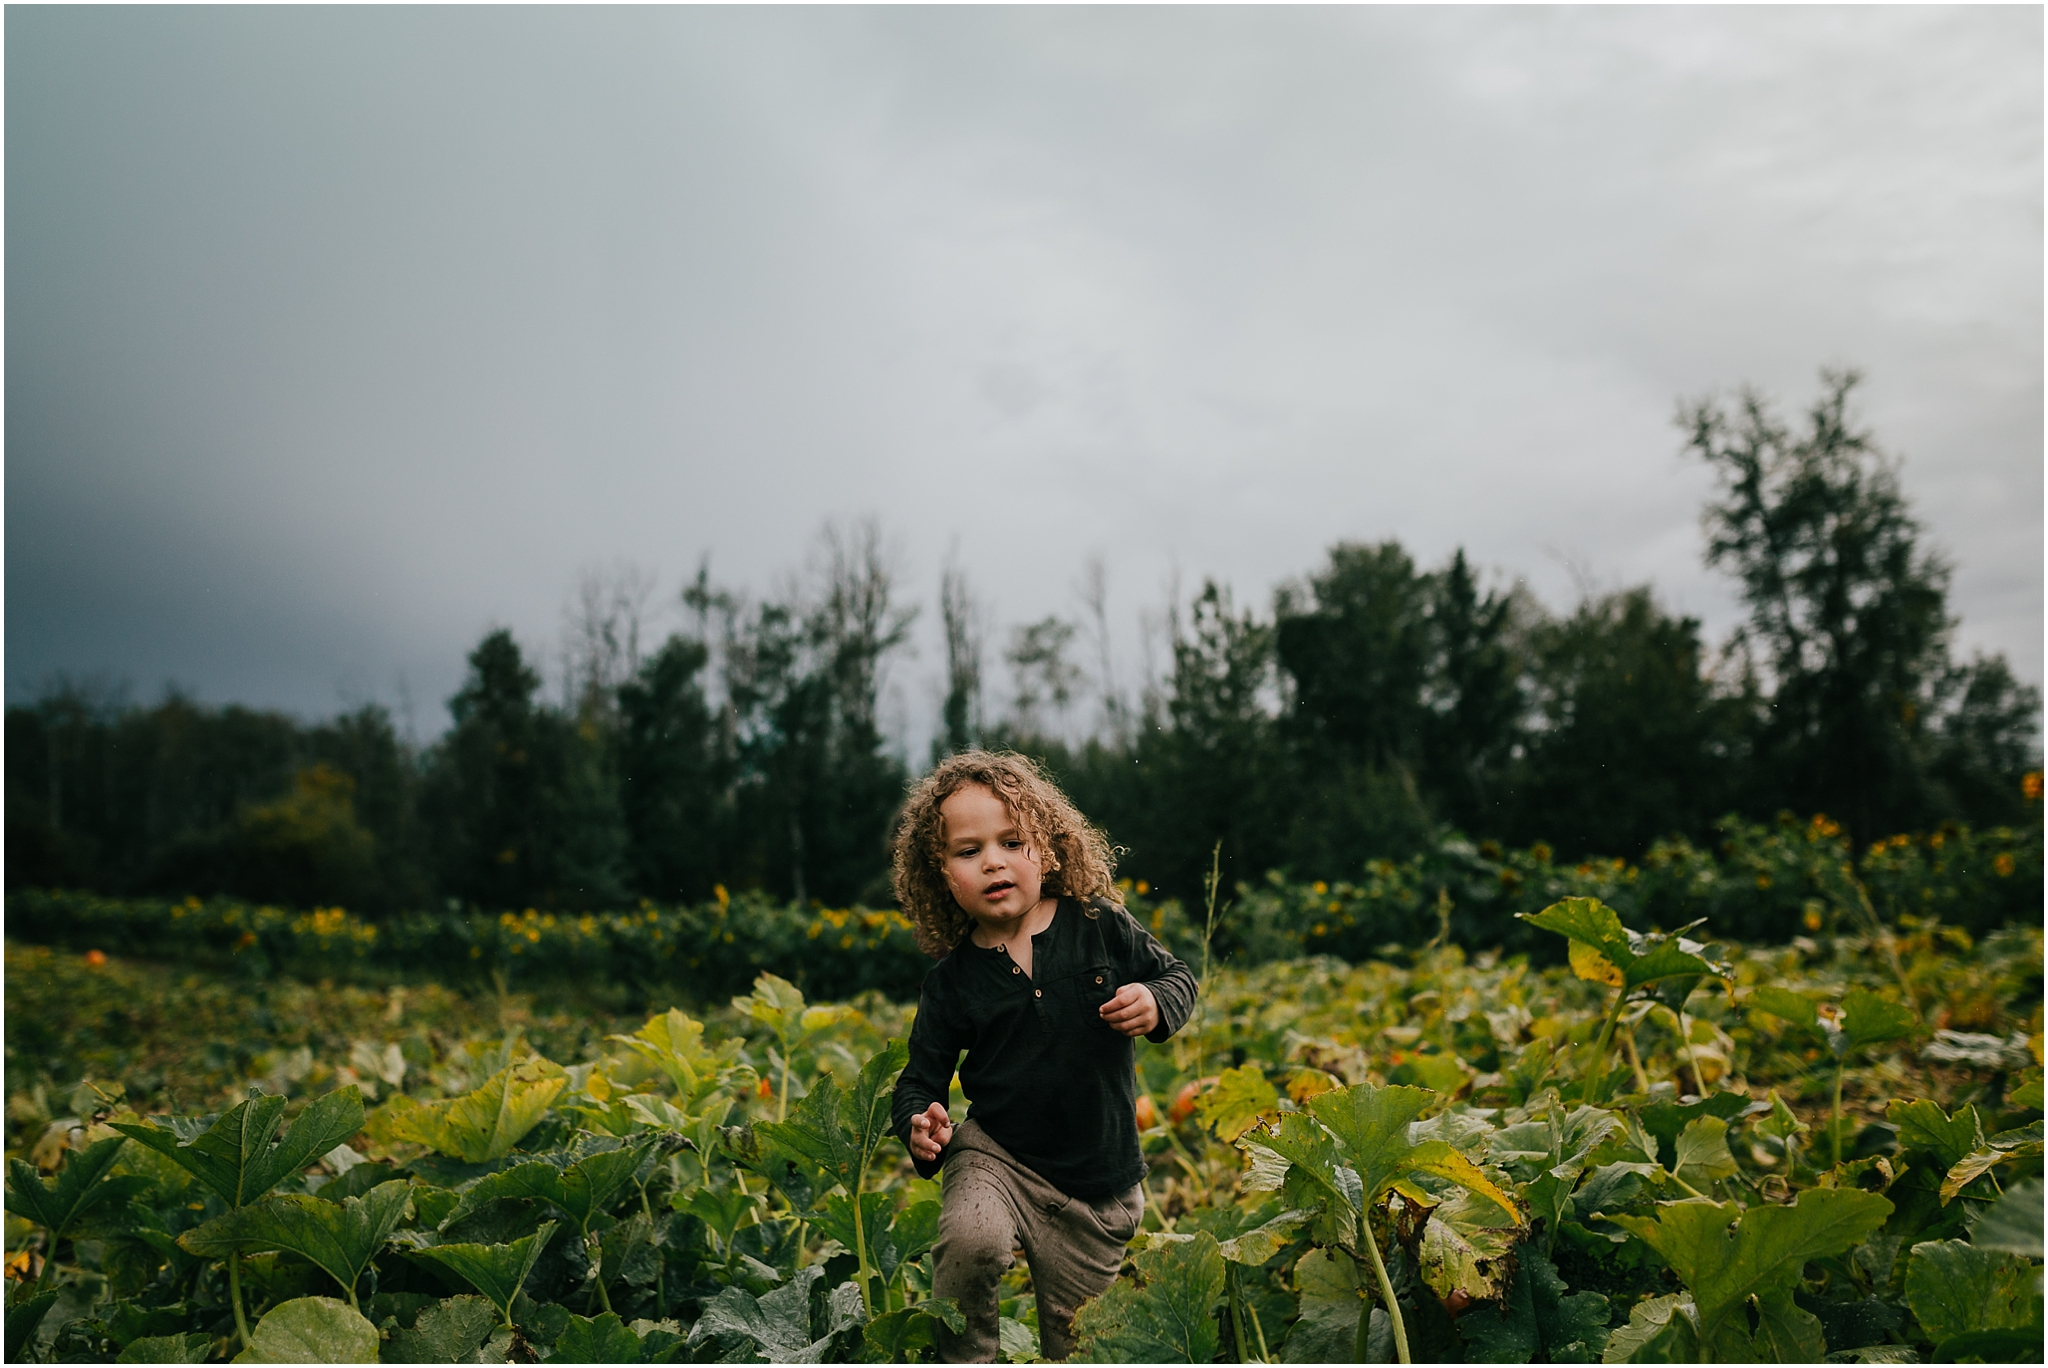 Treelines Photography - Edmonton Family Photographer - Pumpkin Patch - Best Fall Activities in Edmonton